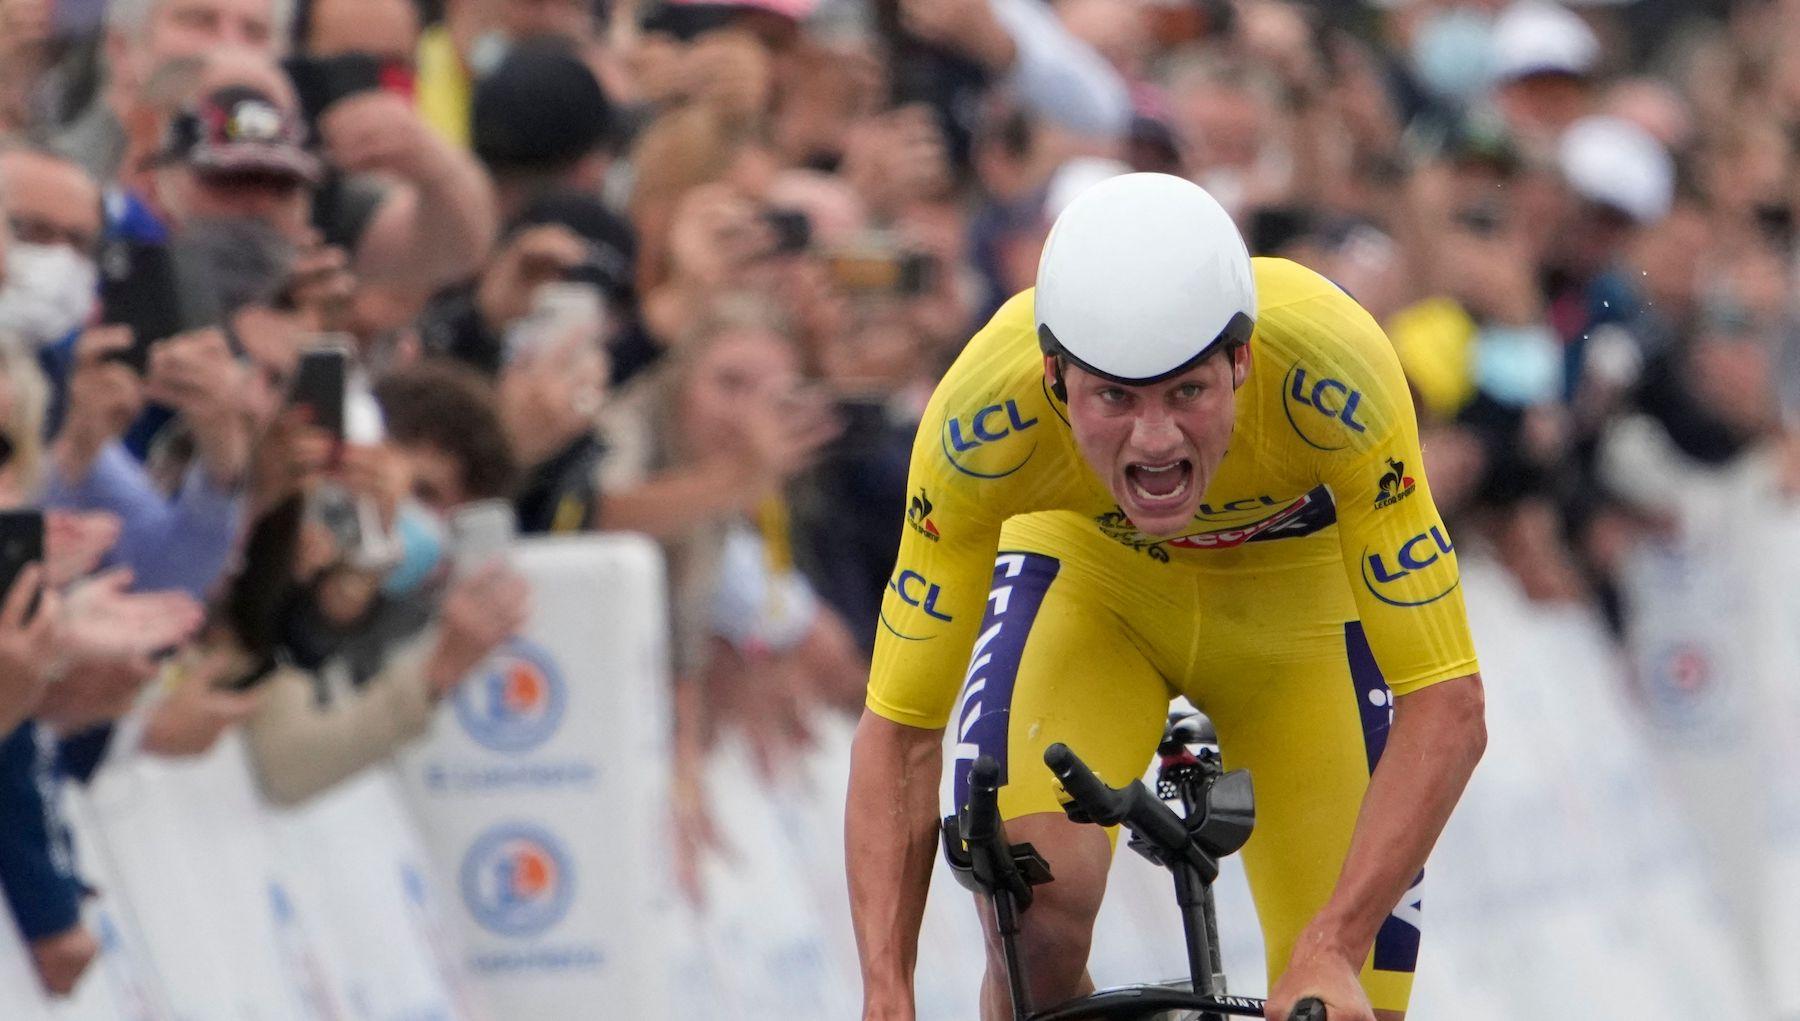 Mathieu van der Poel keeps yellow on stage five of the Tour de France